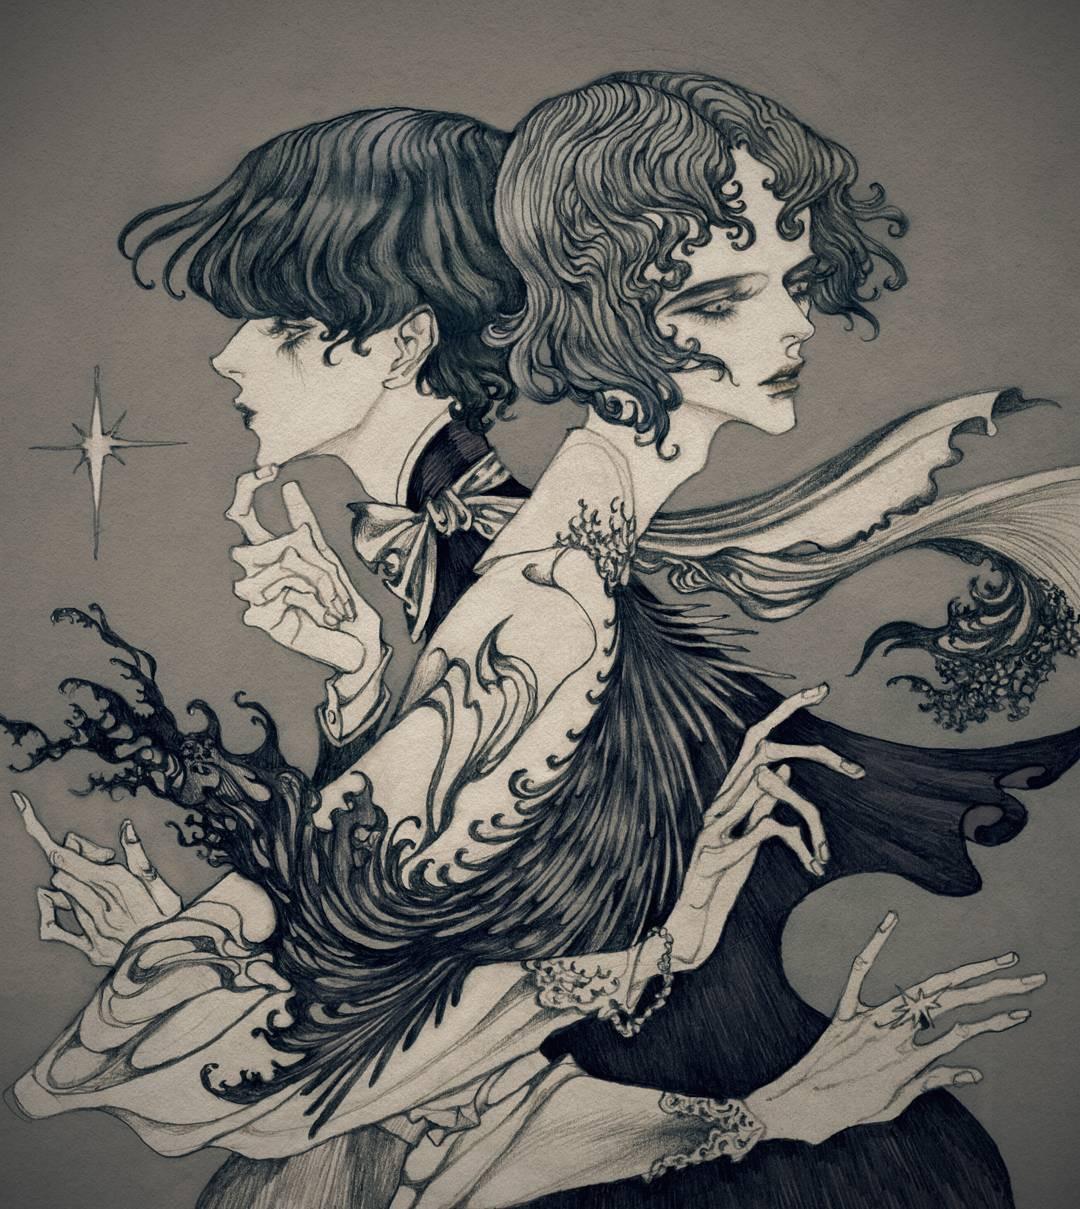 j.i.nnn, illustration, painting, obscure, dark